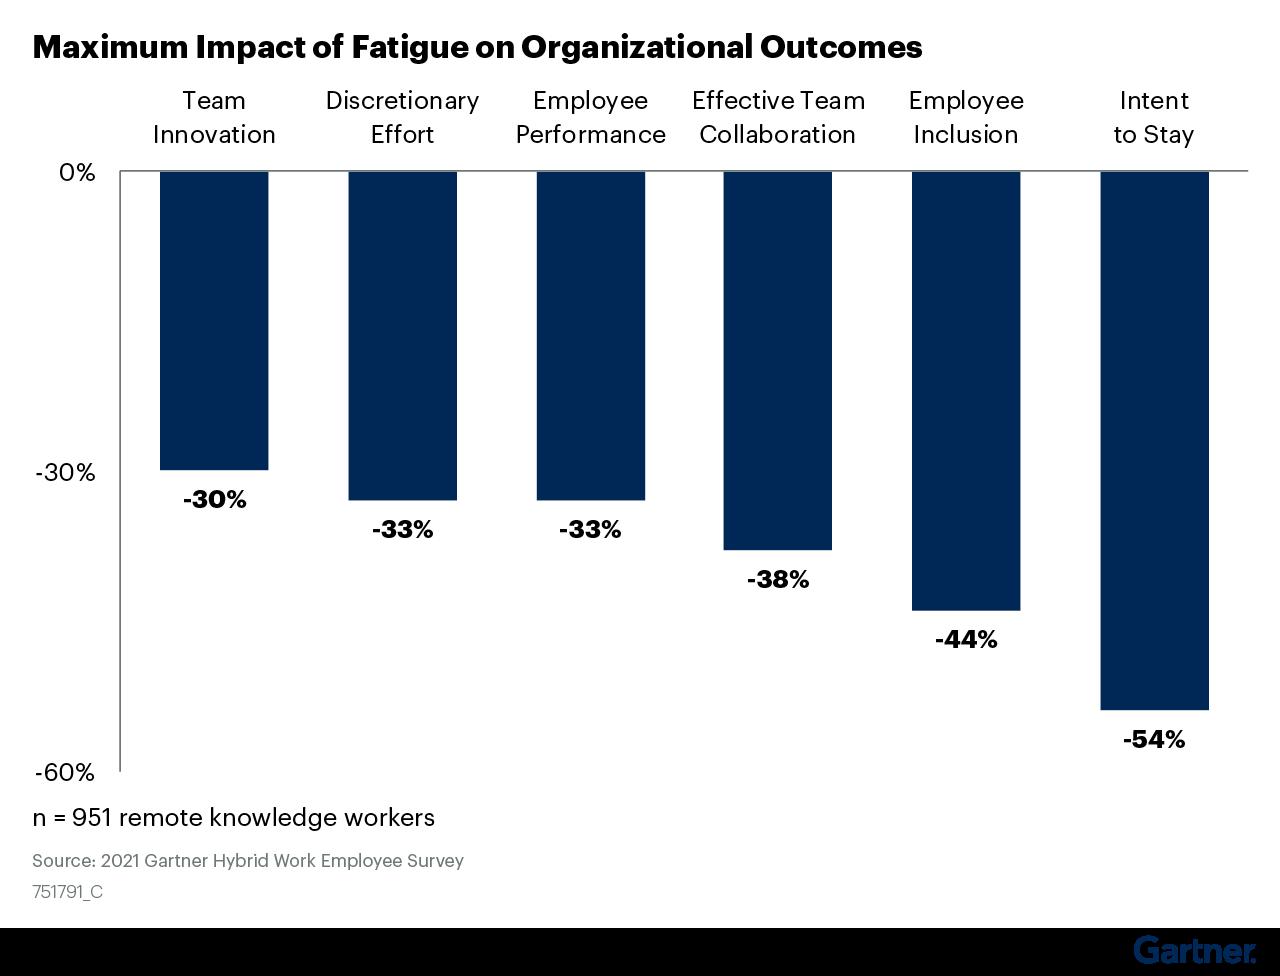 Figure 3: Maximum Impact of Fatigue on Organizational Outcomes